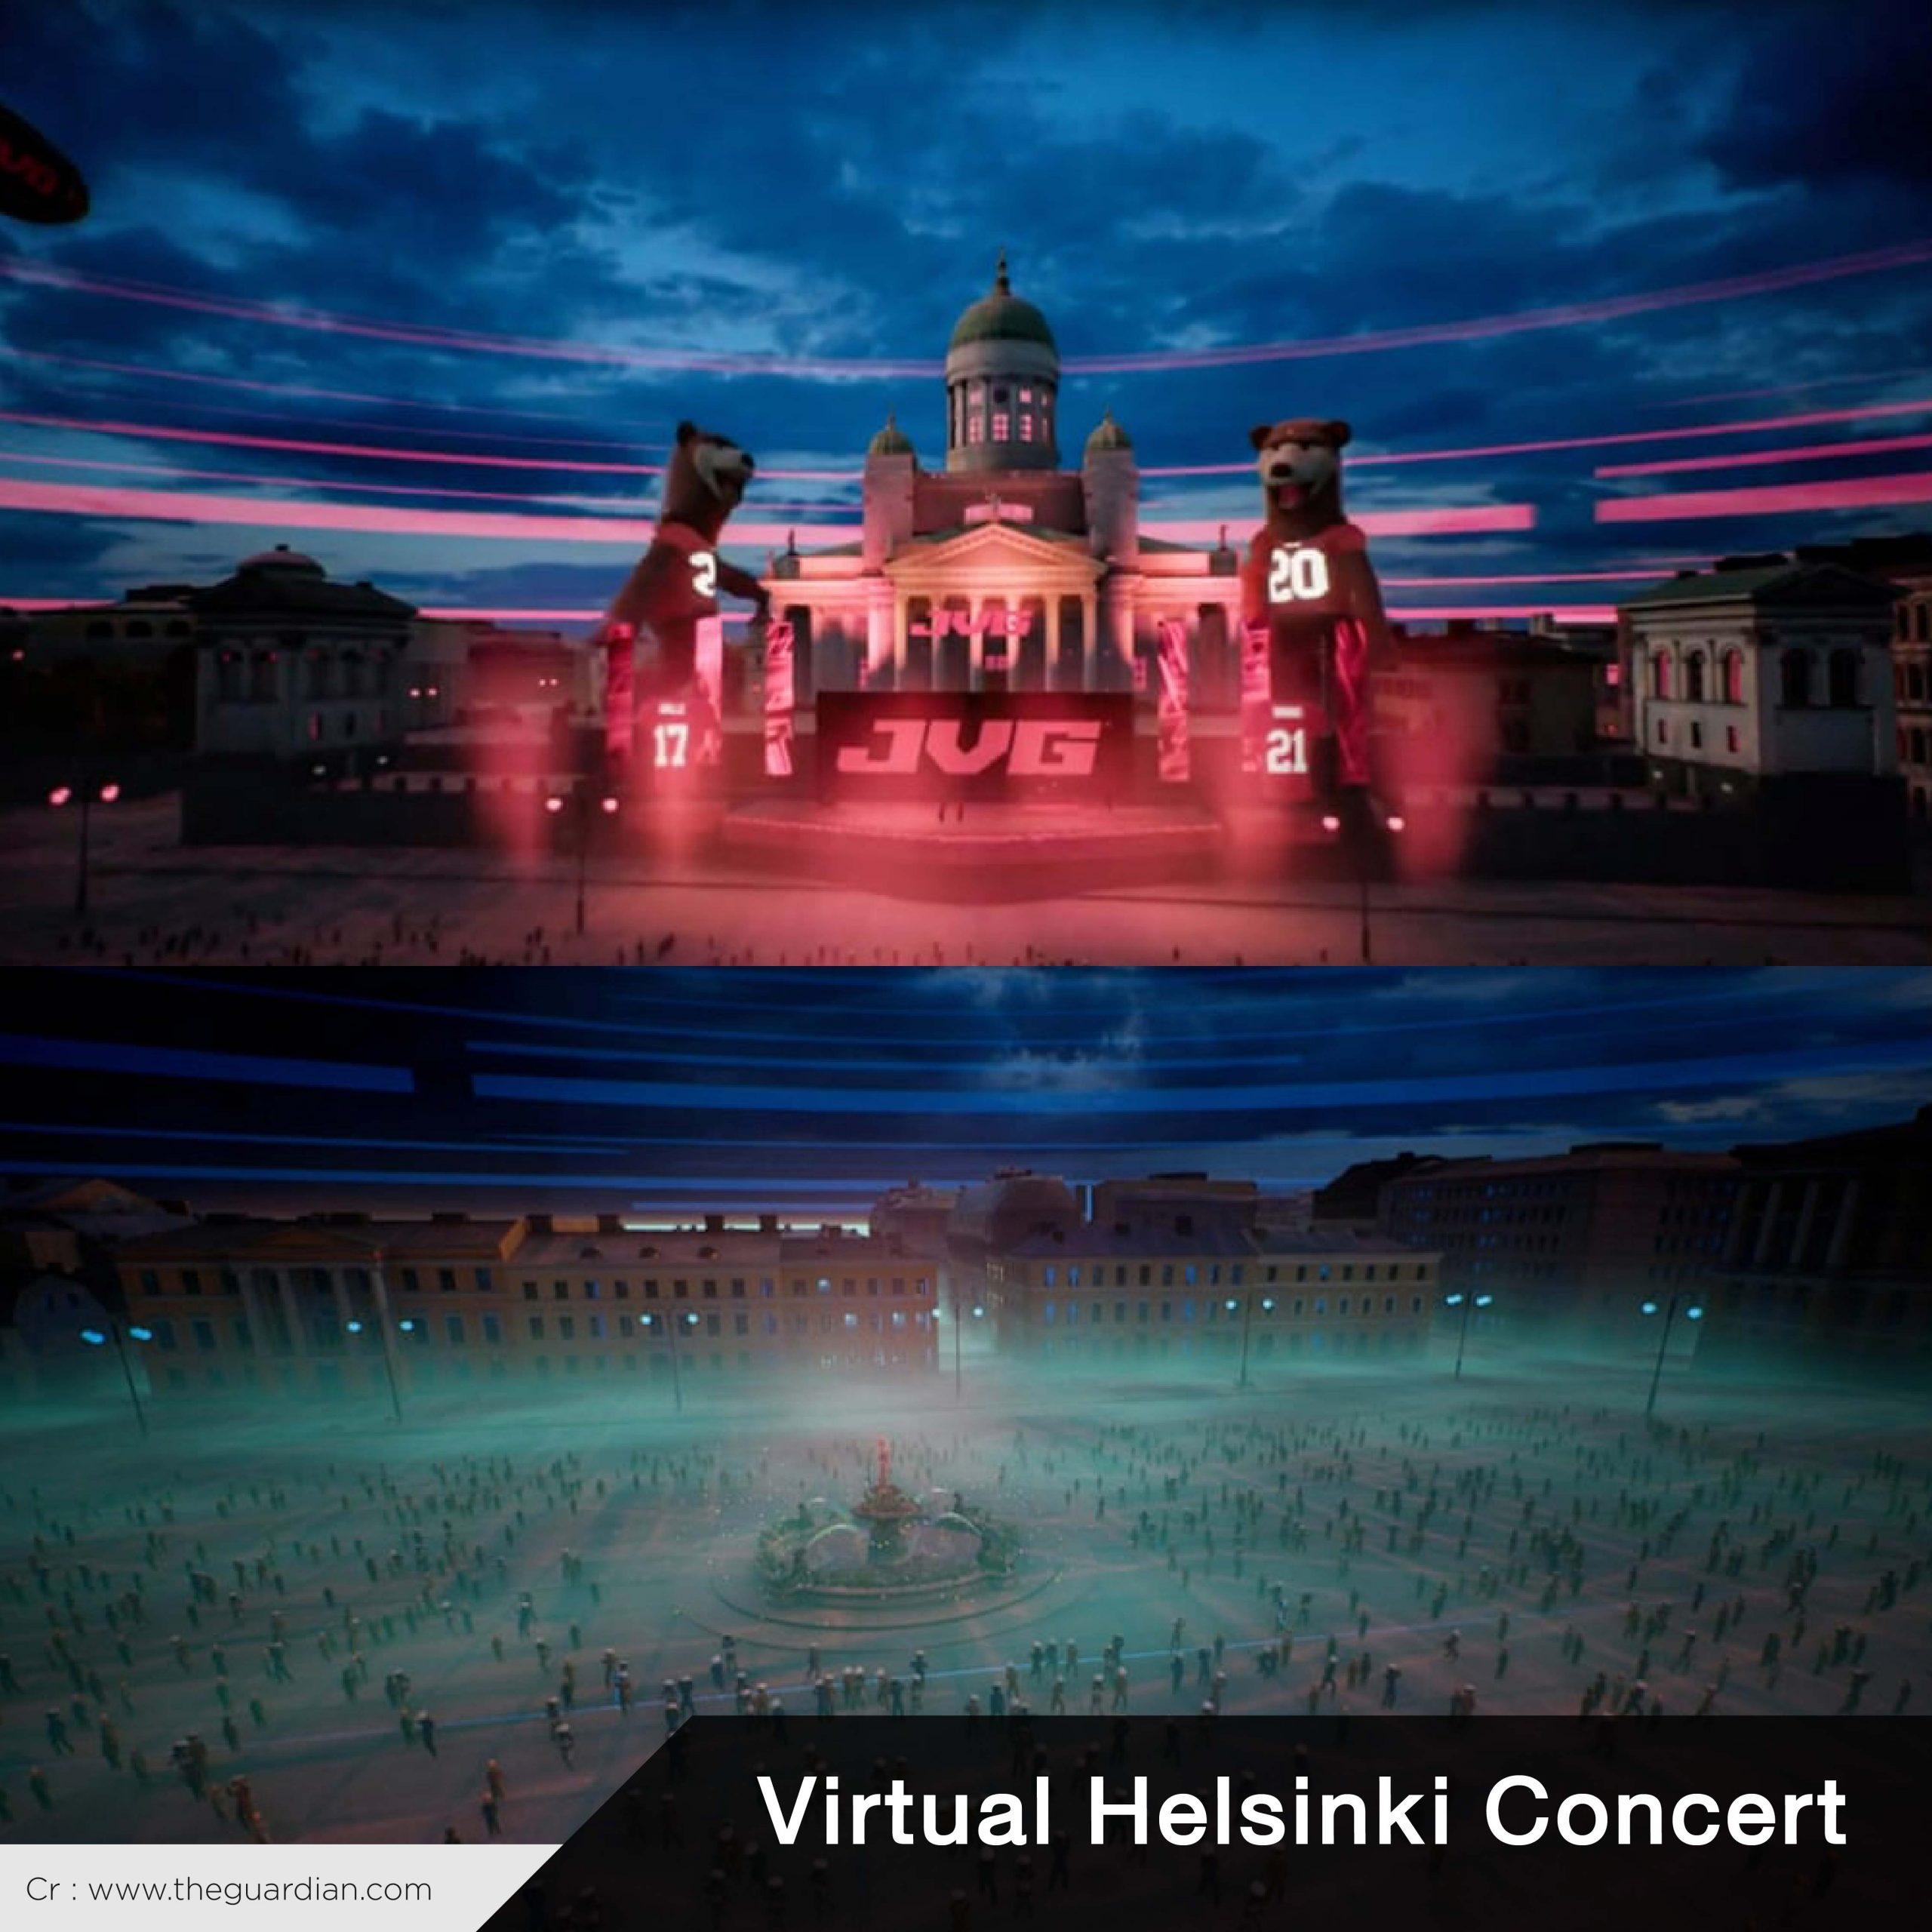 Virtual Concert Virtual Helsinki Concert